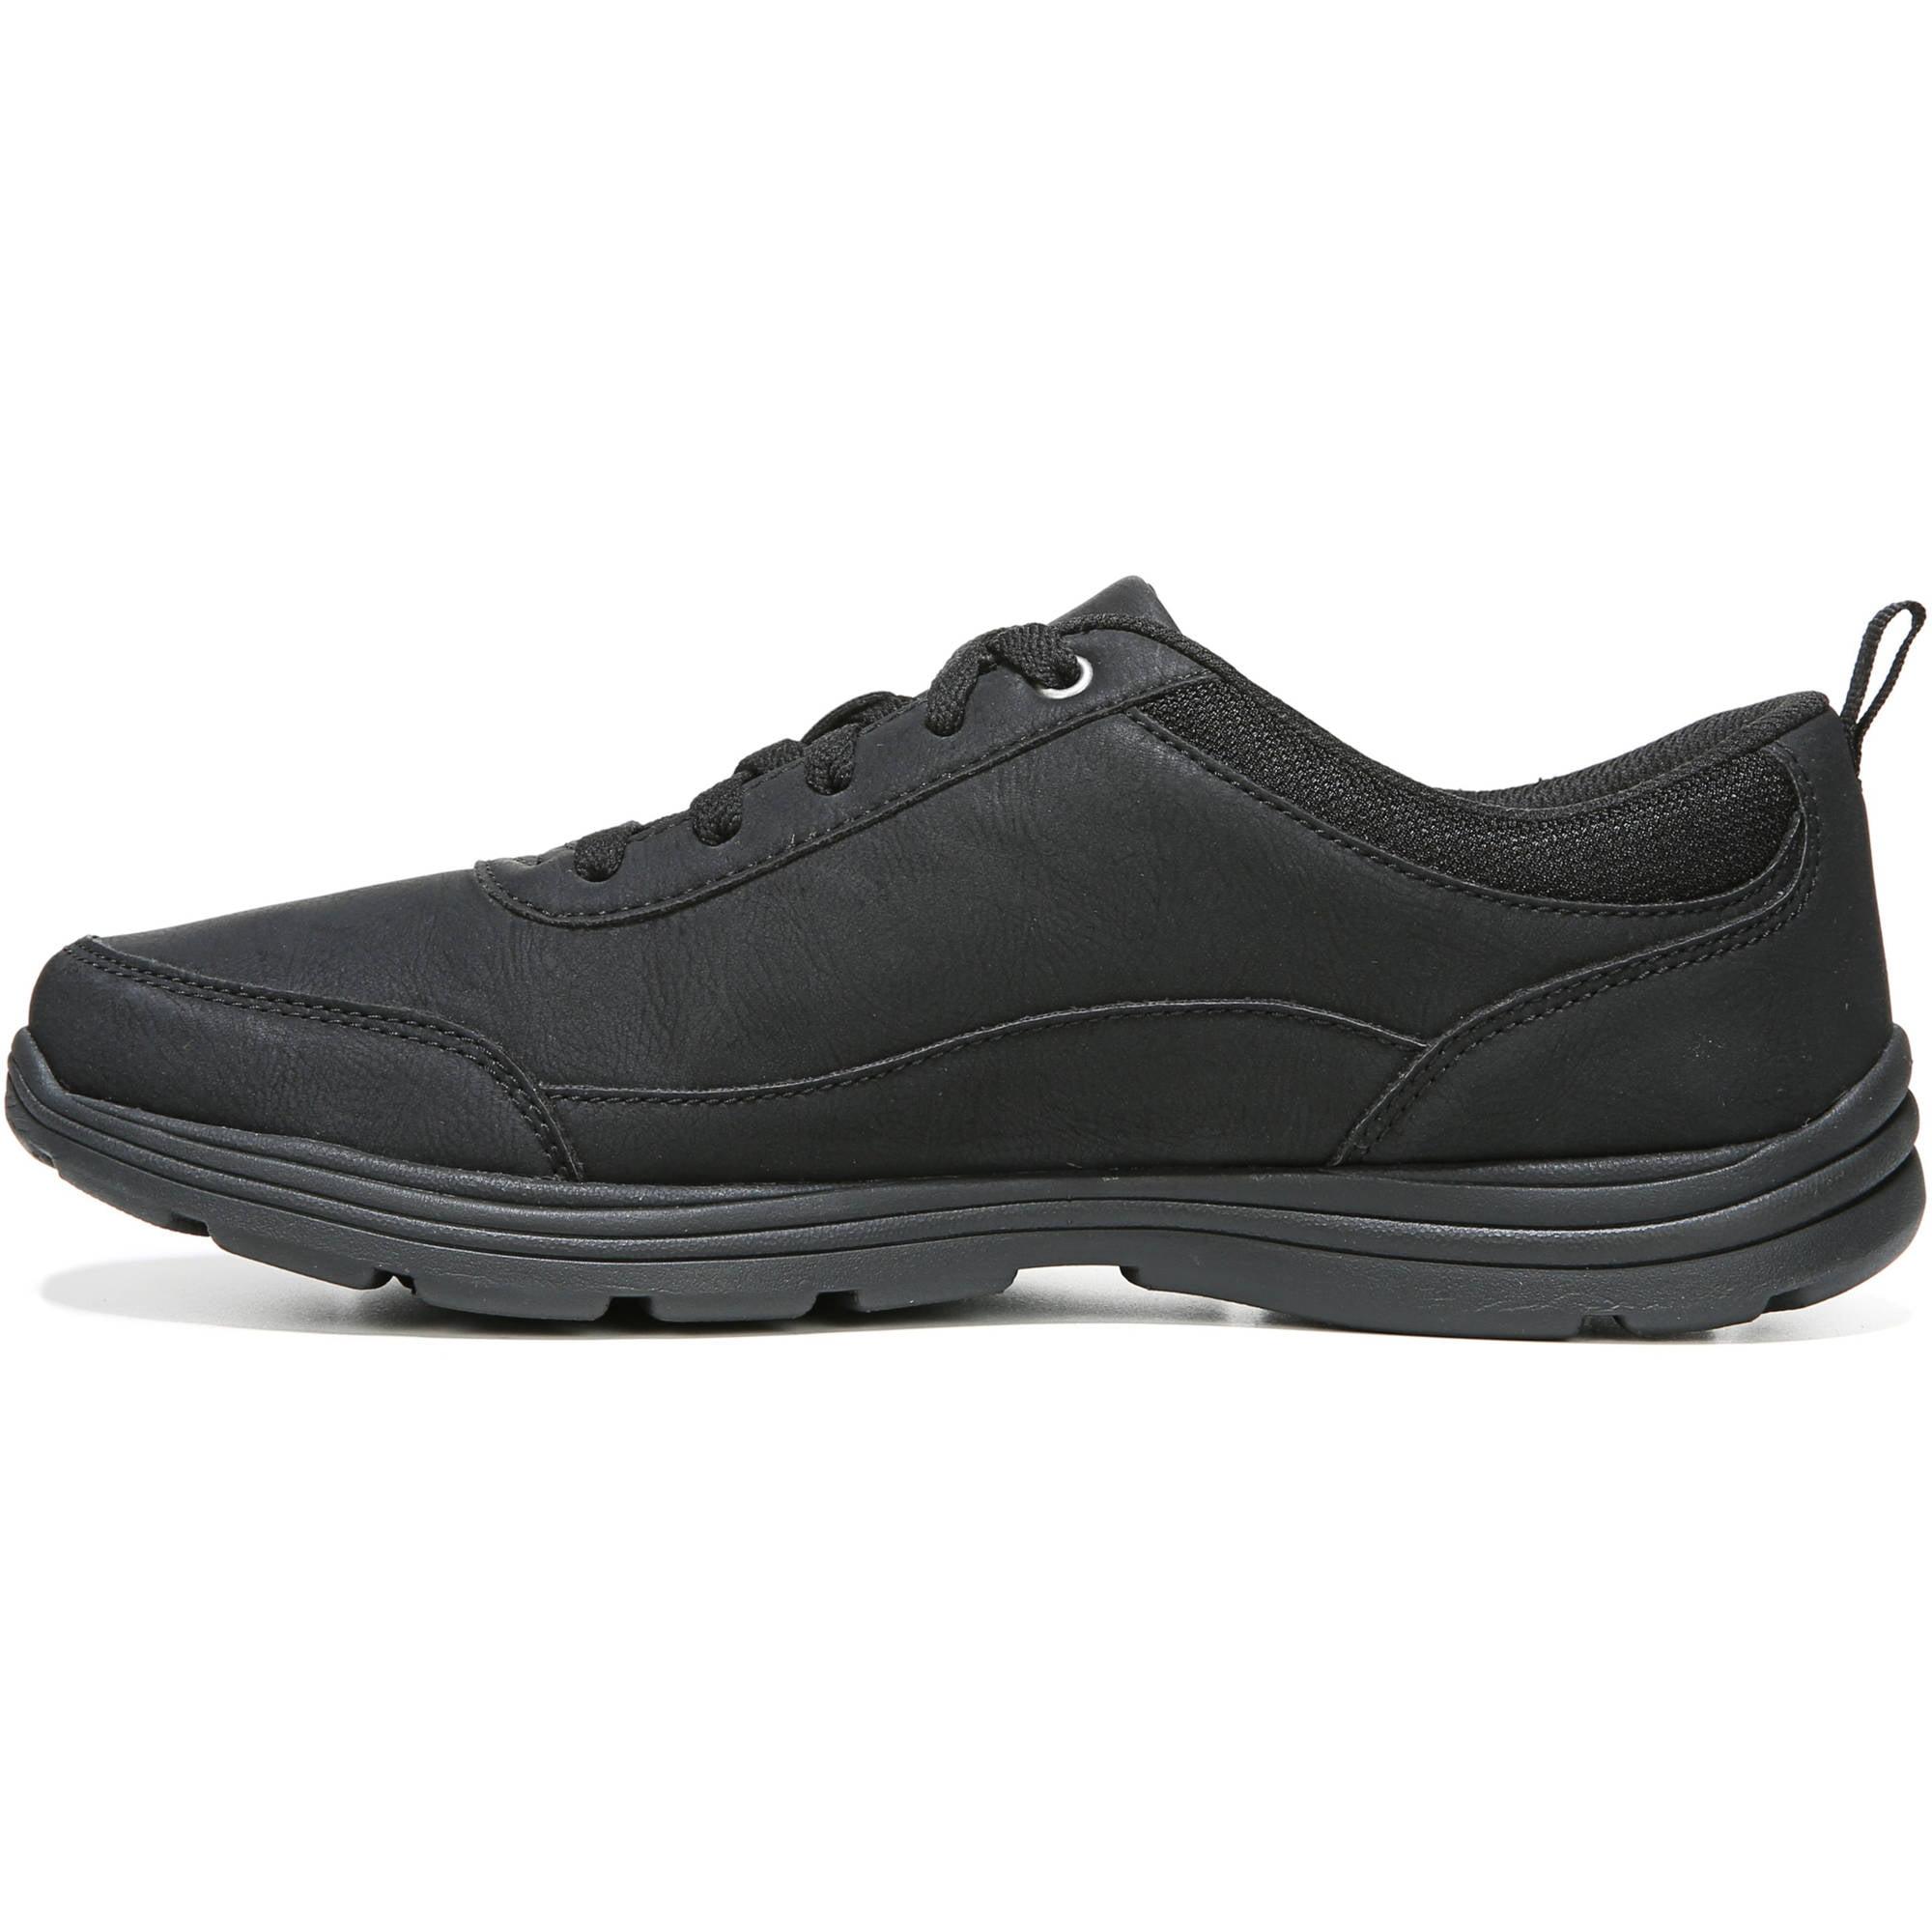 dr scholls mens filo memory foam shoe outdoor athletic